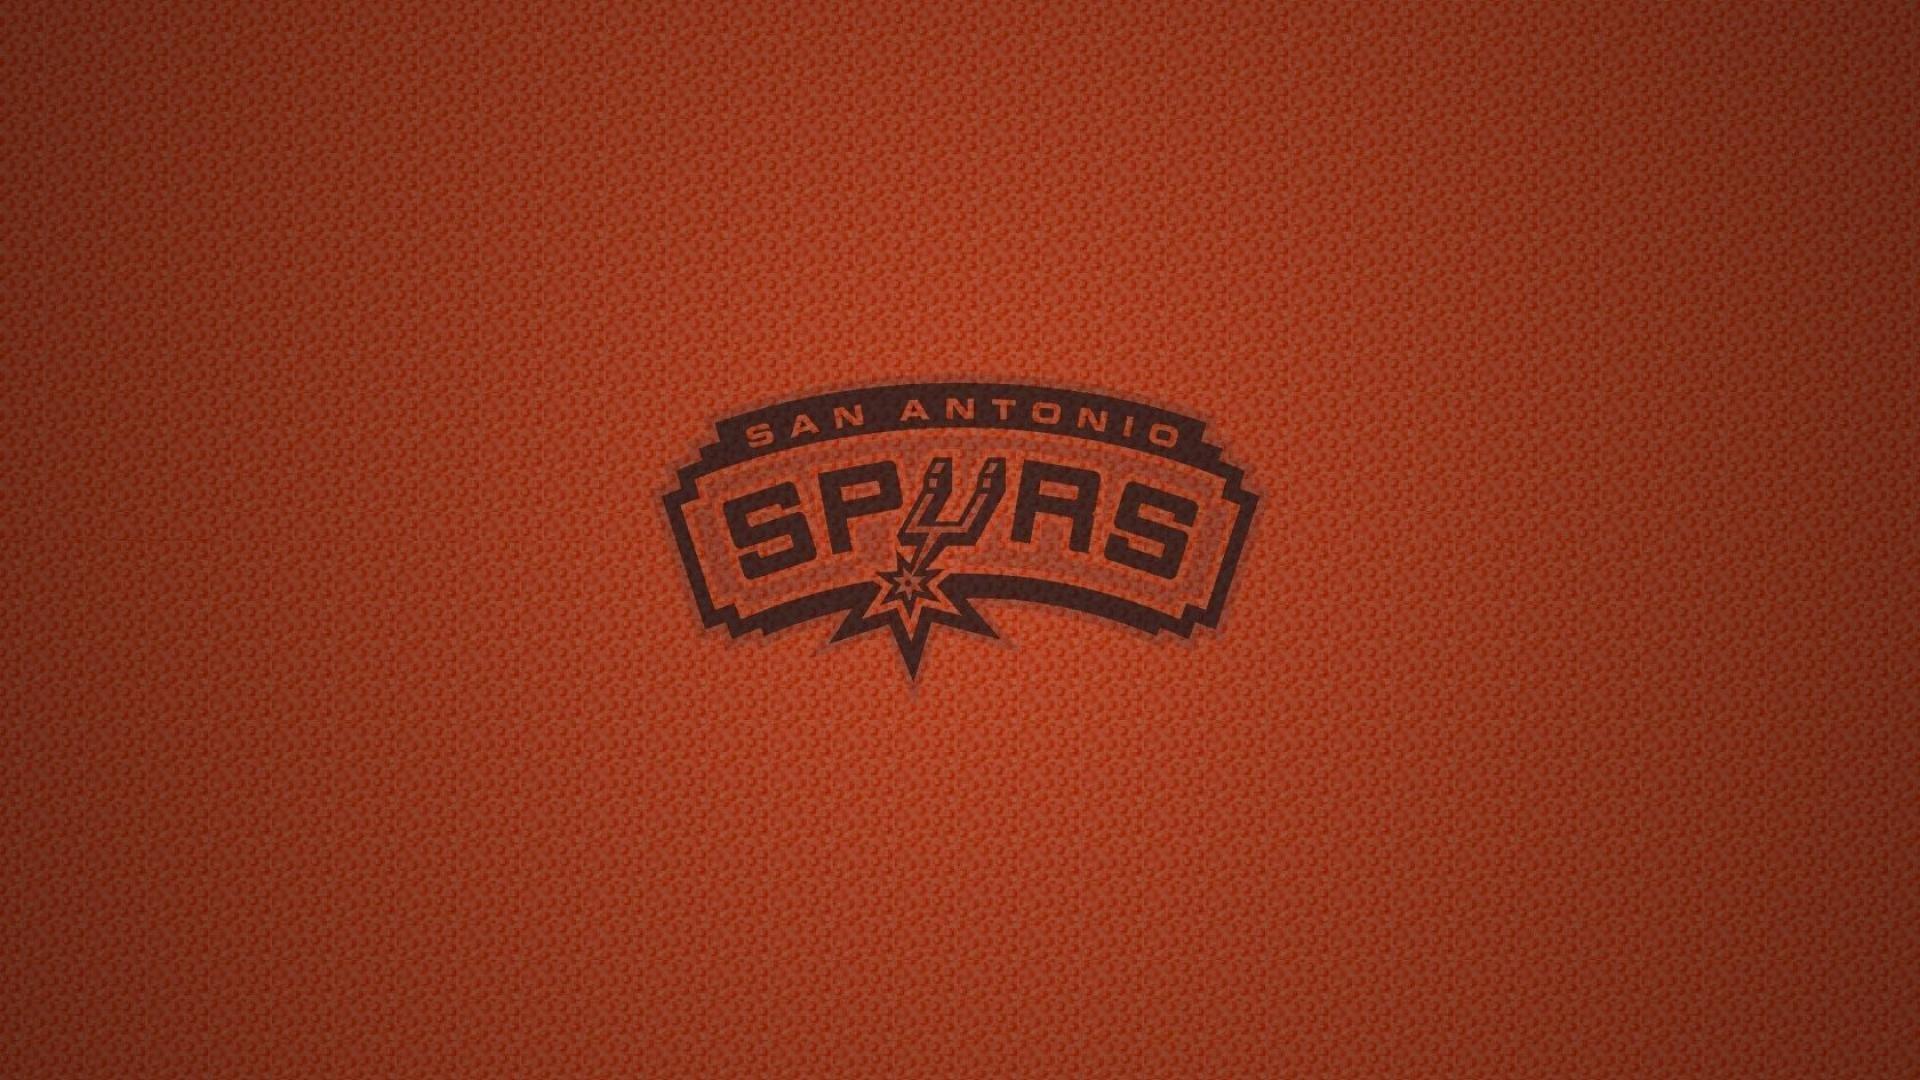 San Antonio Spurs free hd wallpaper